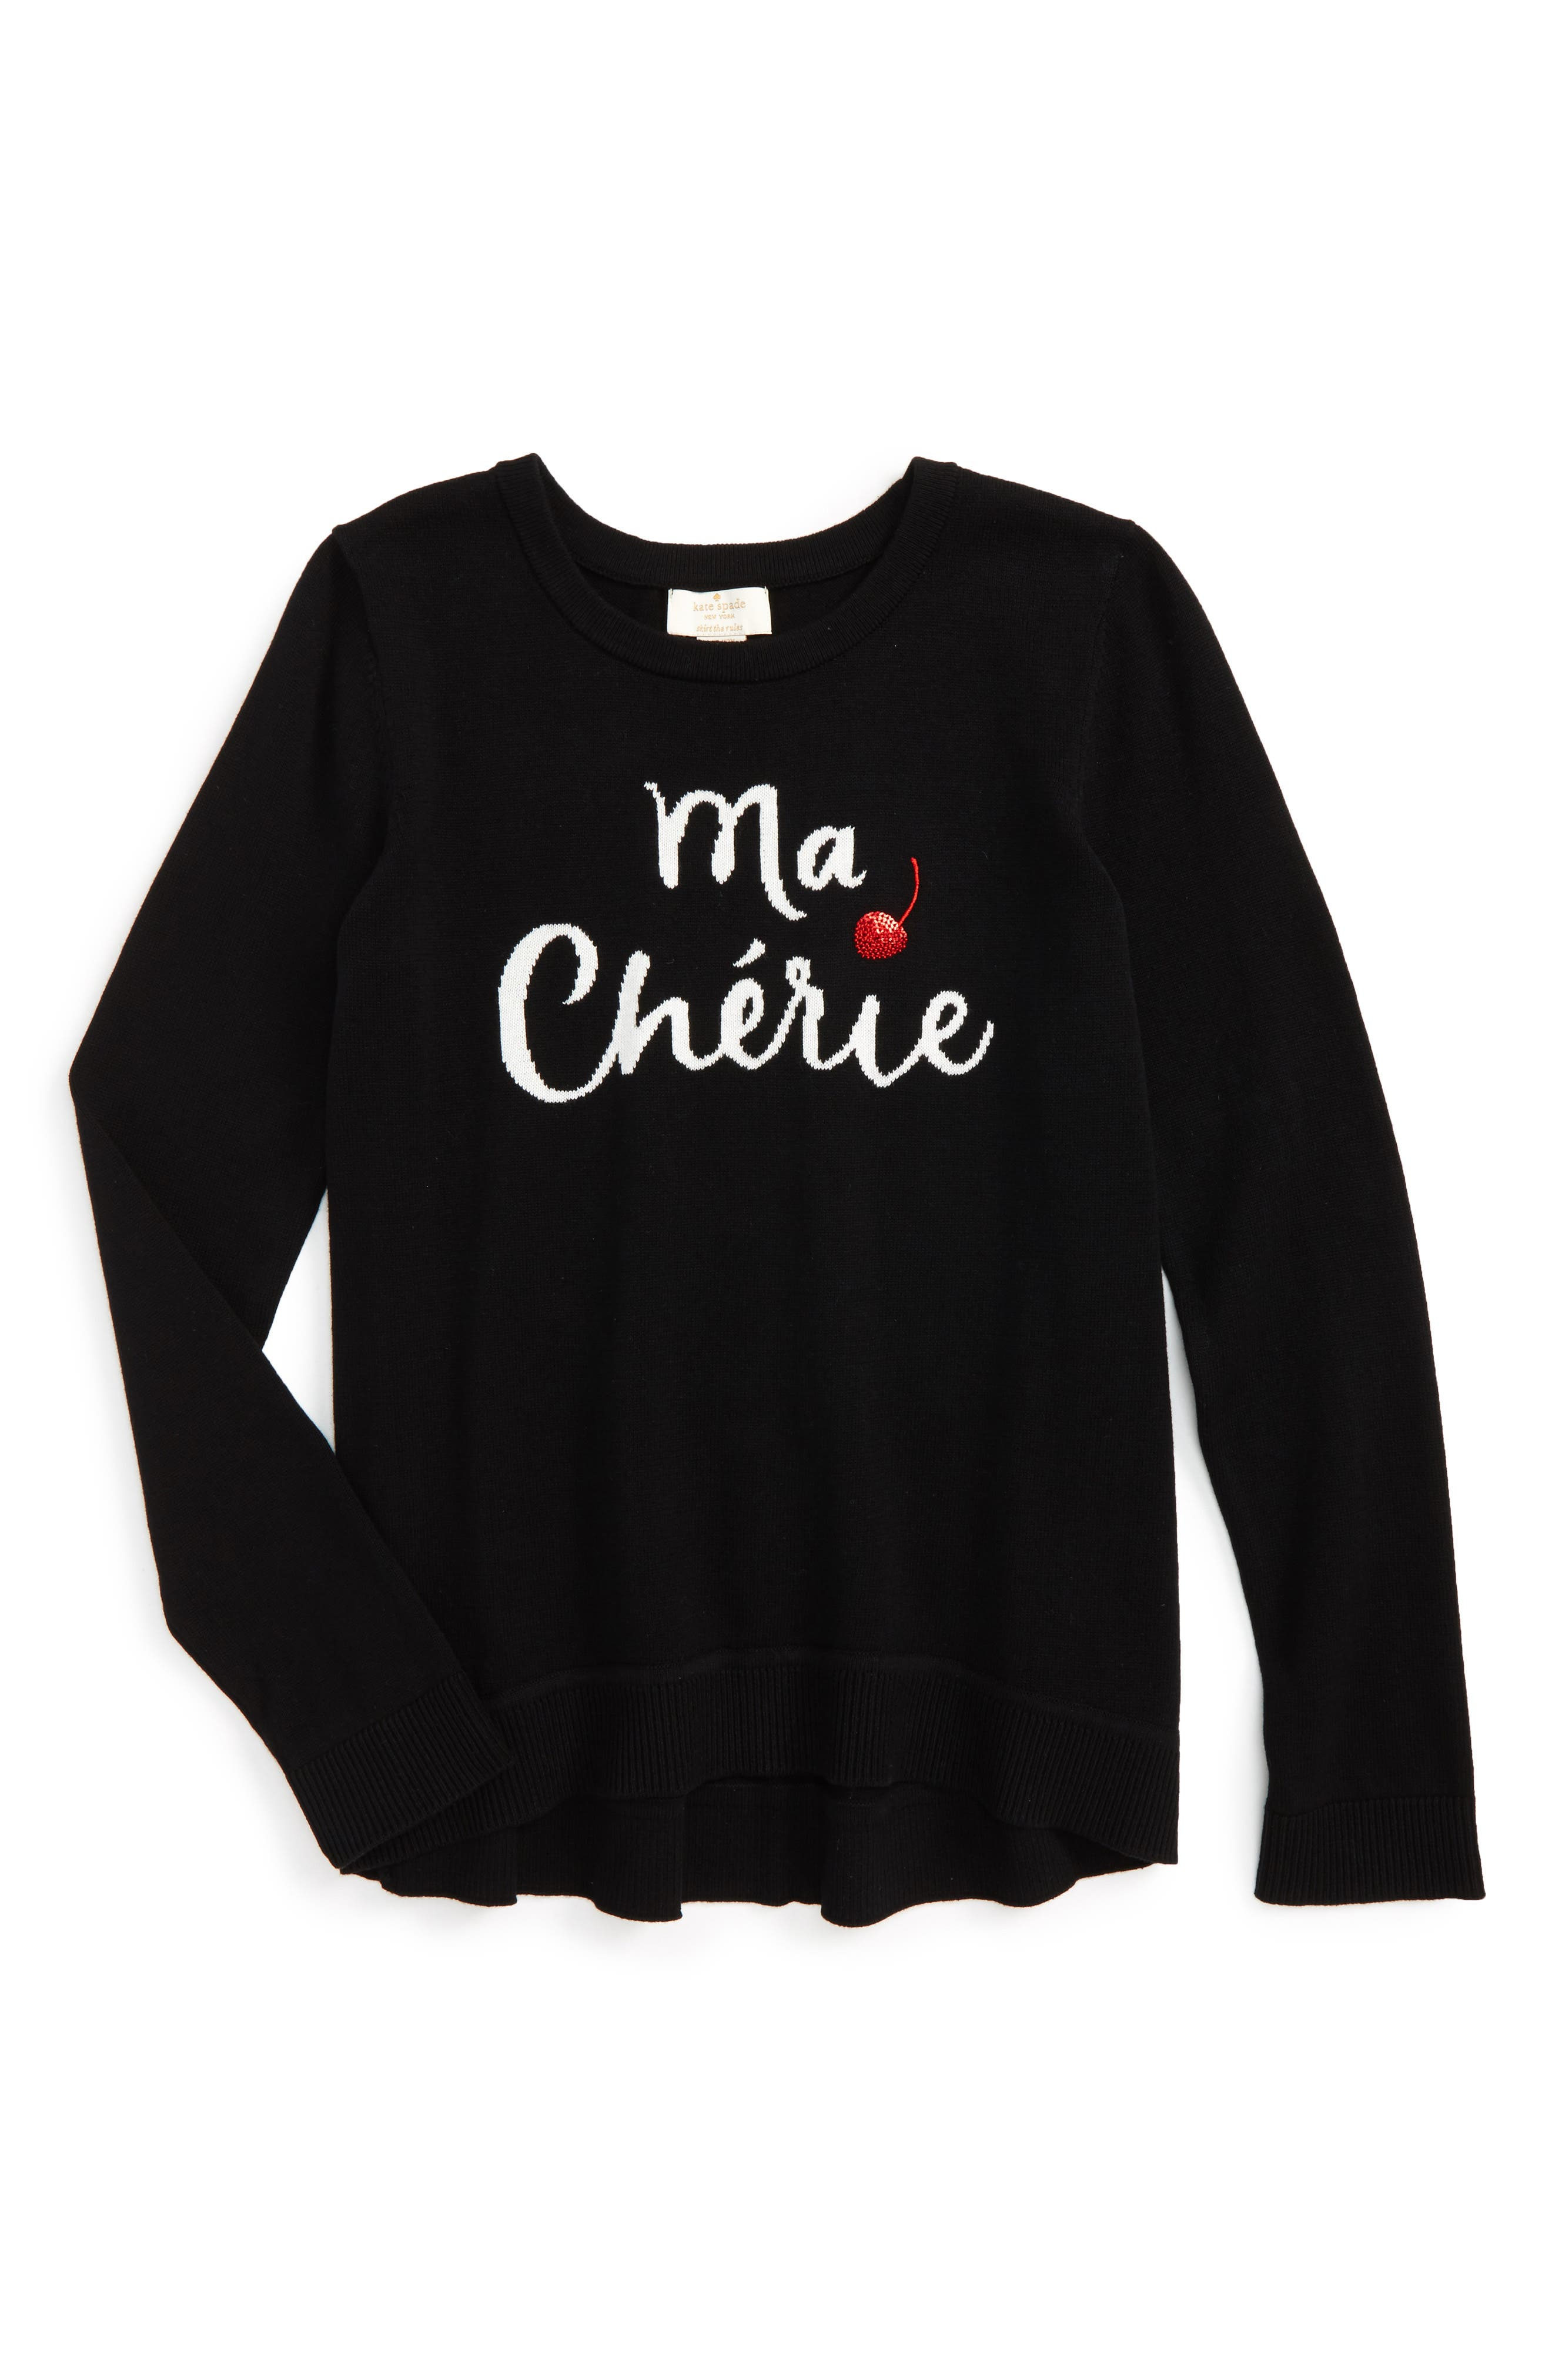 Main Image - kate spade new york ma cherie intasrsia sweater (Big Girls)